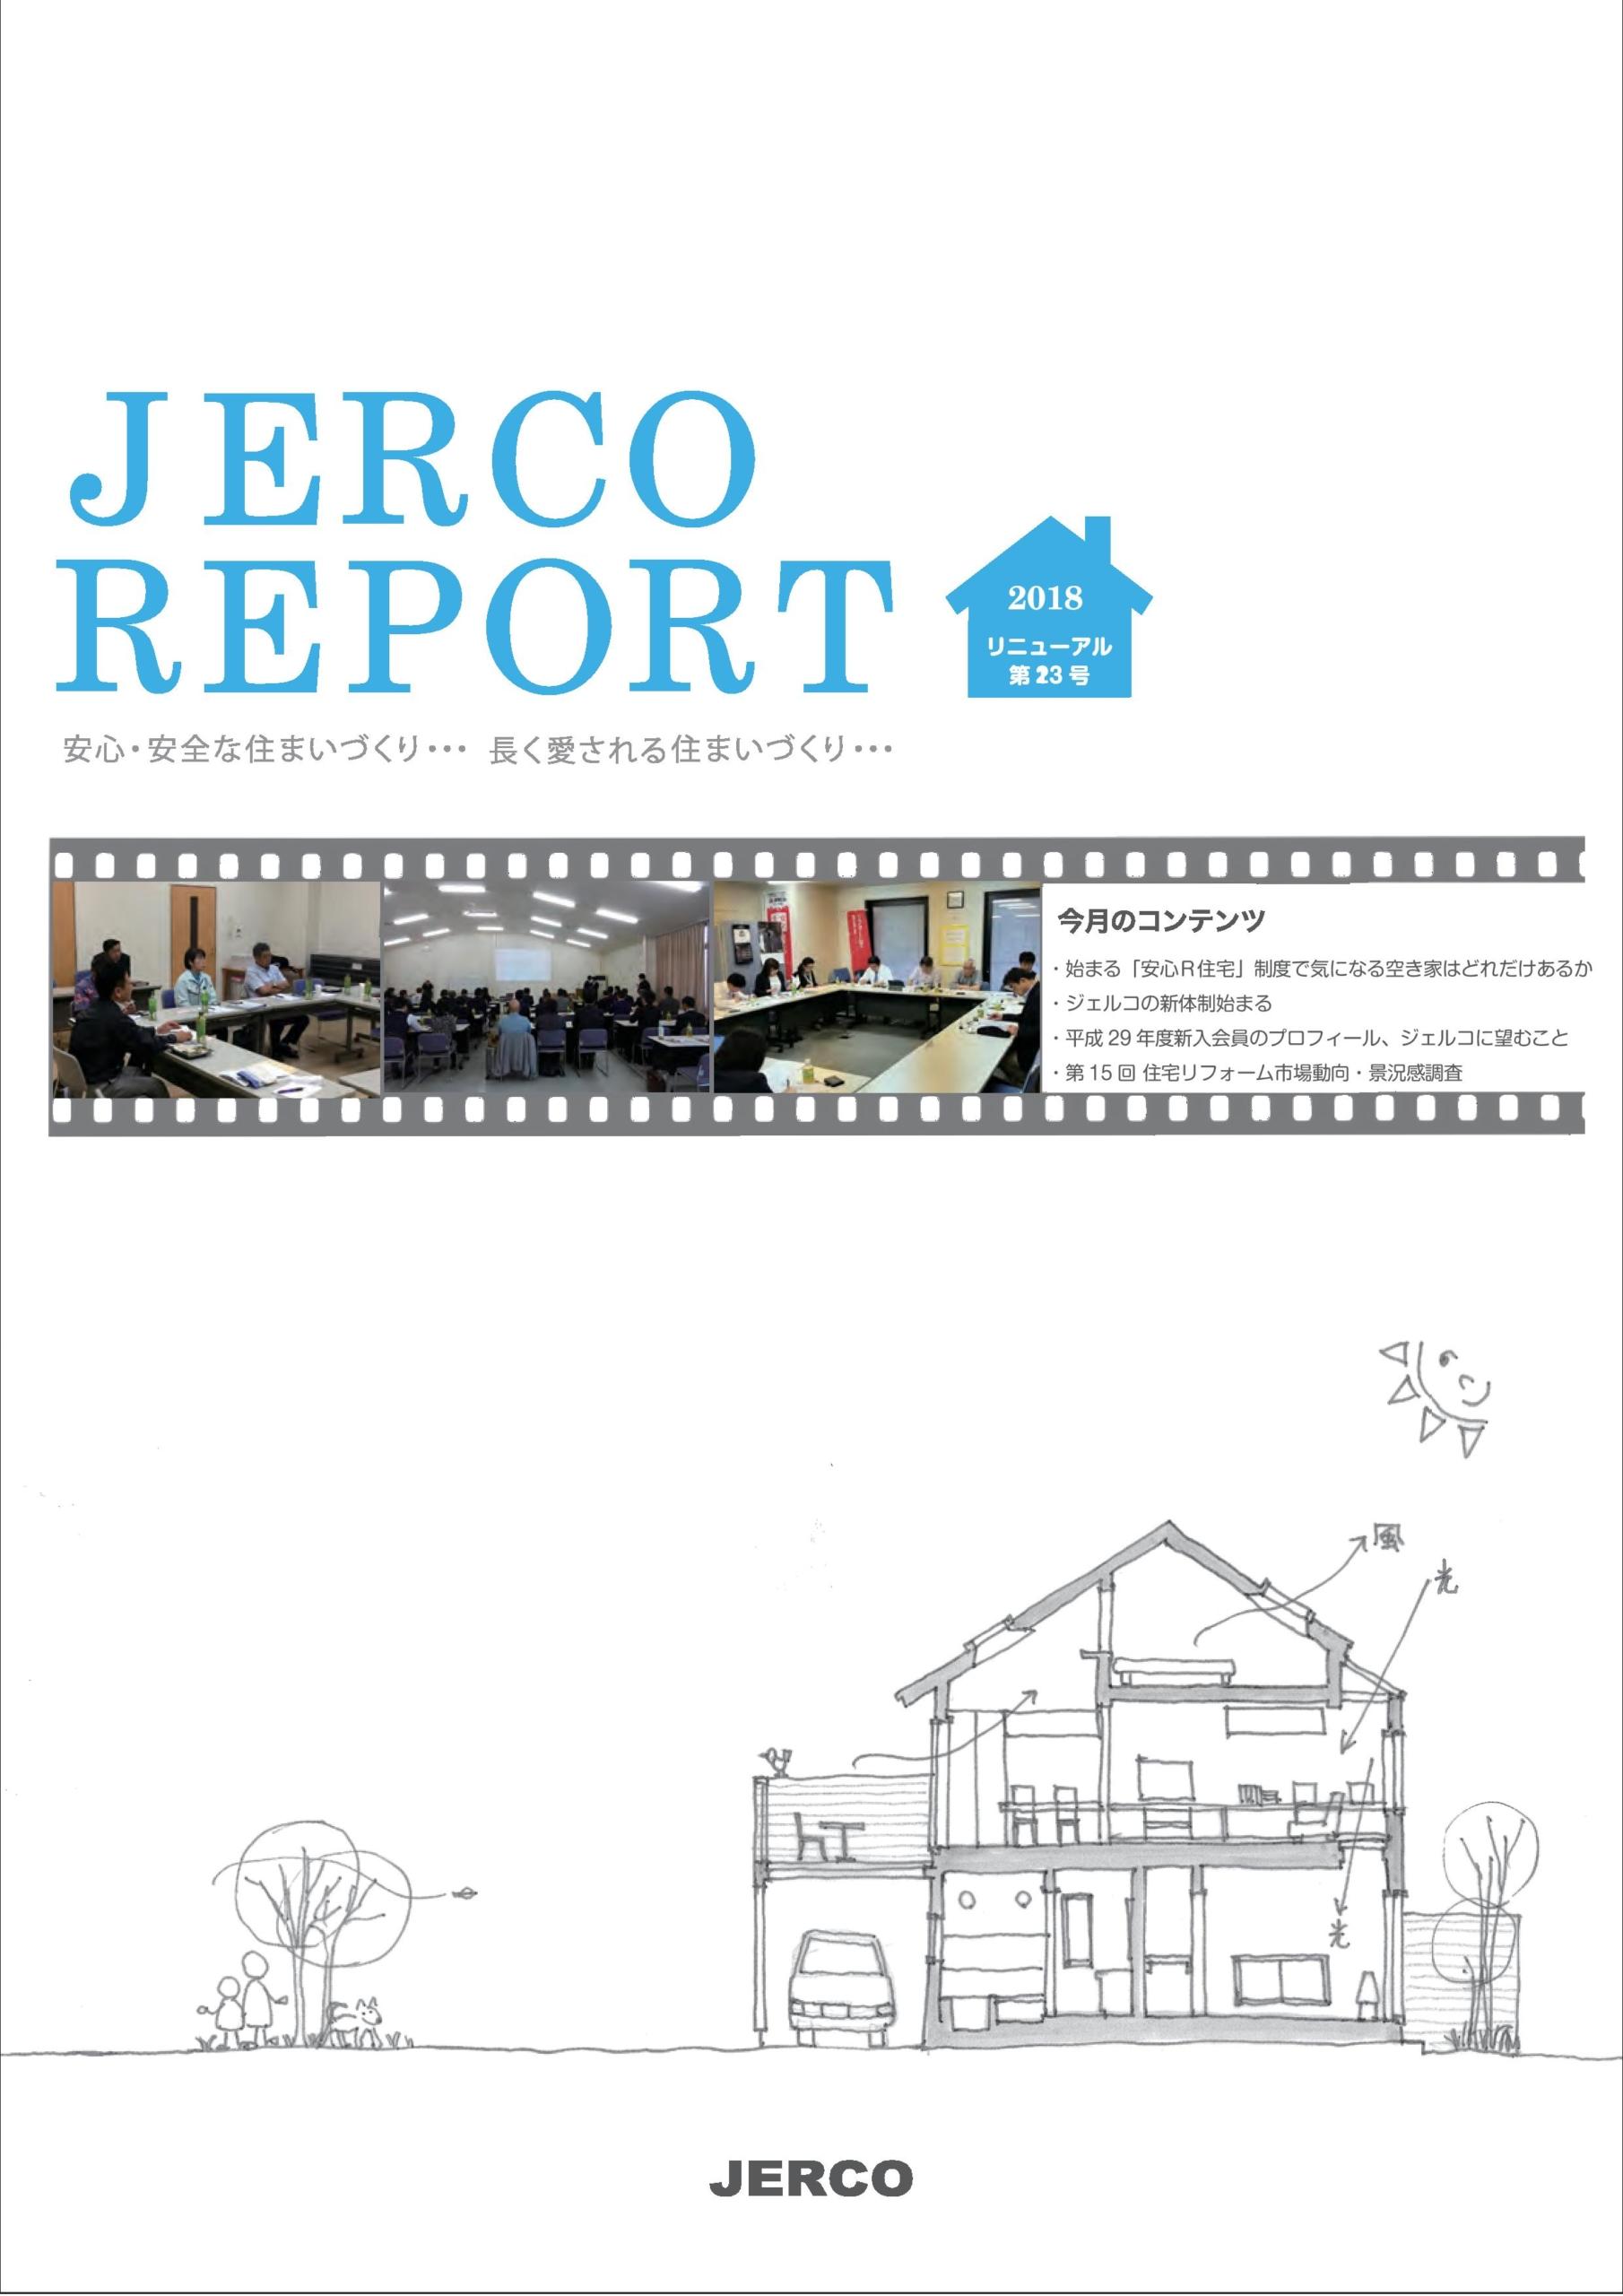 JERCO REPORT リニューアル第23号